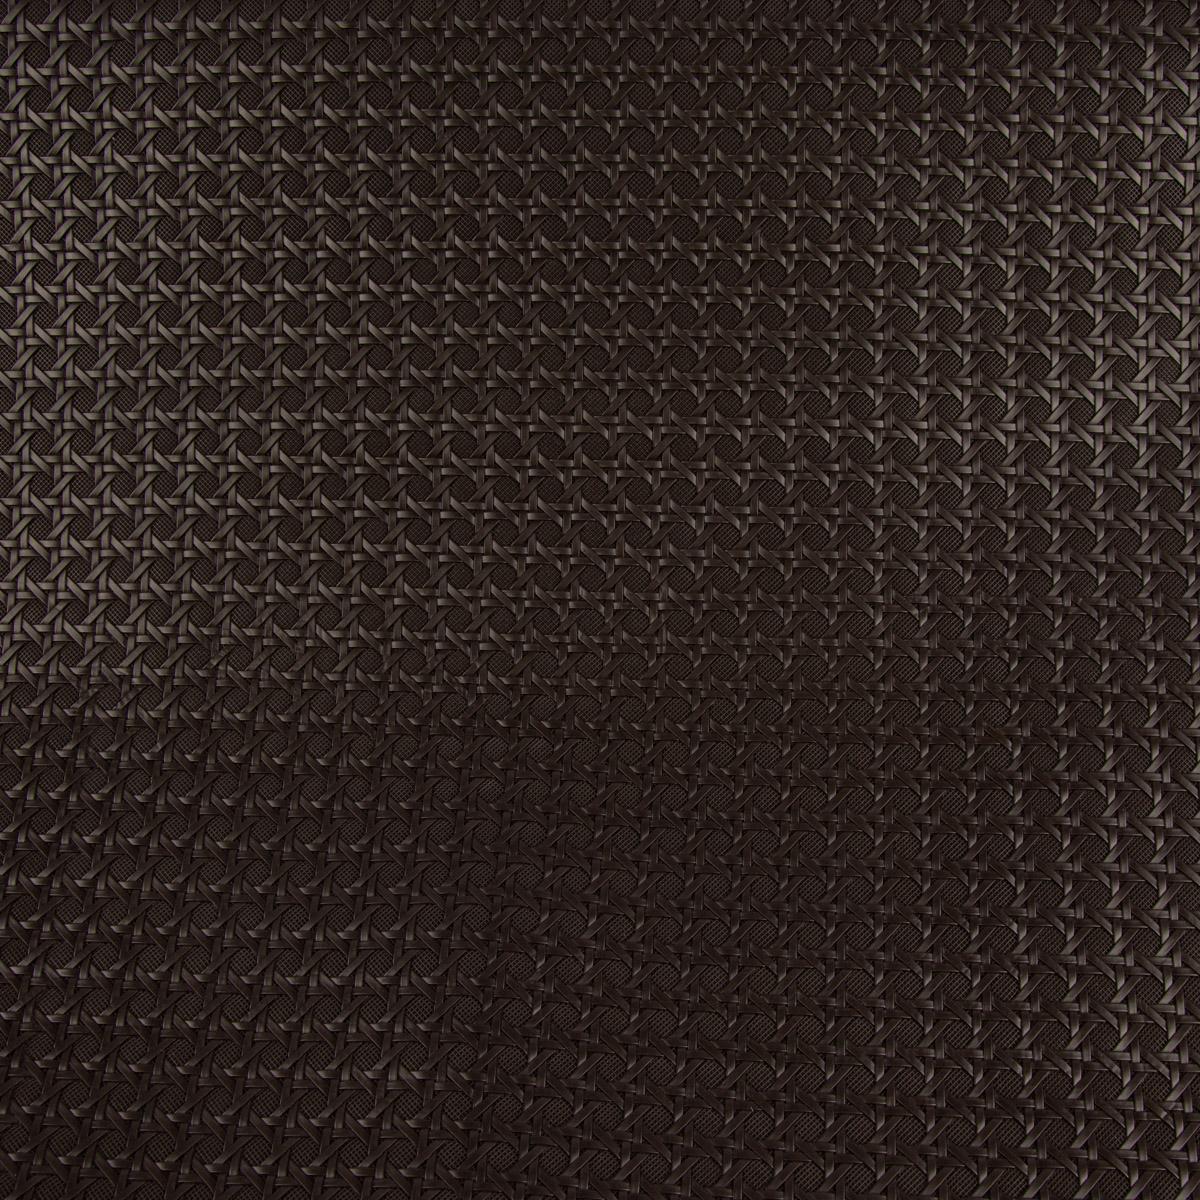 Kunstleder Lederimitat Struktur Geometrisch Relief braun lakritz 1,4m Breite